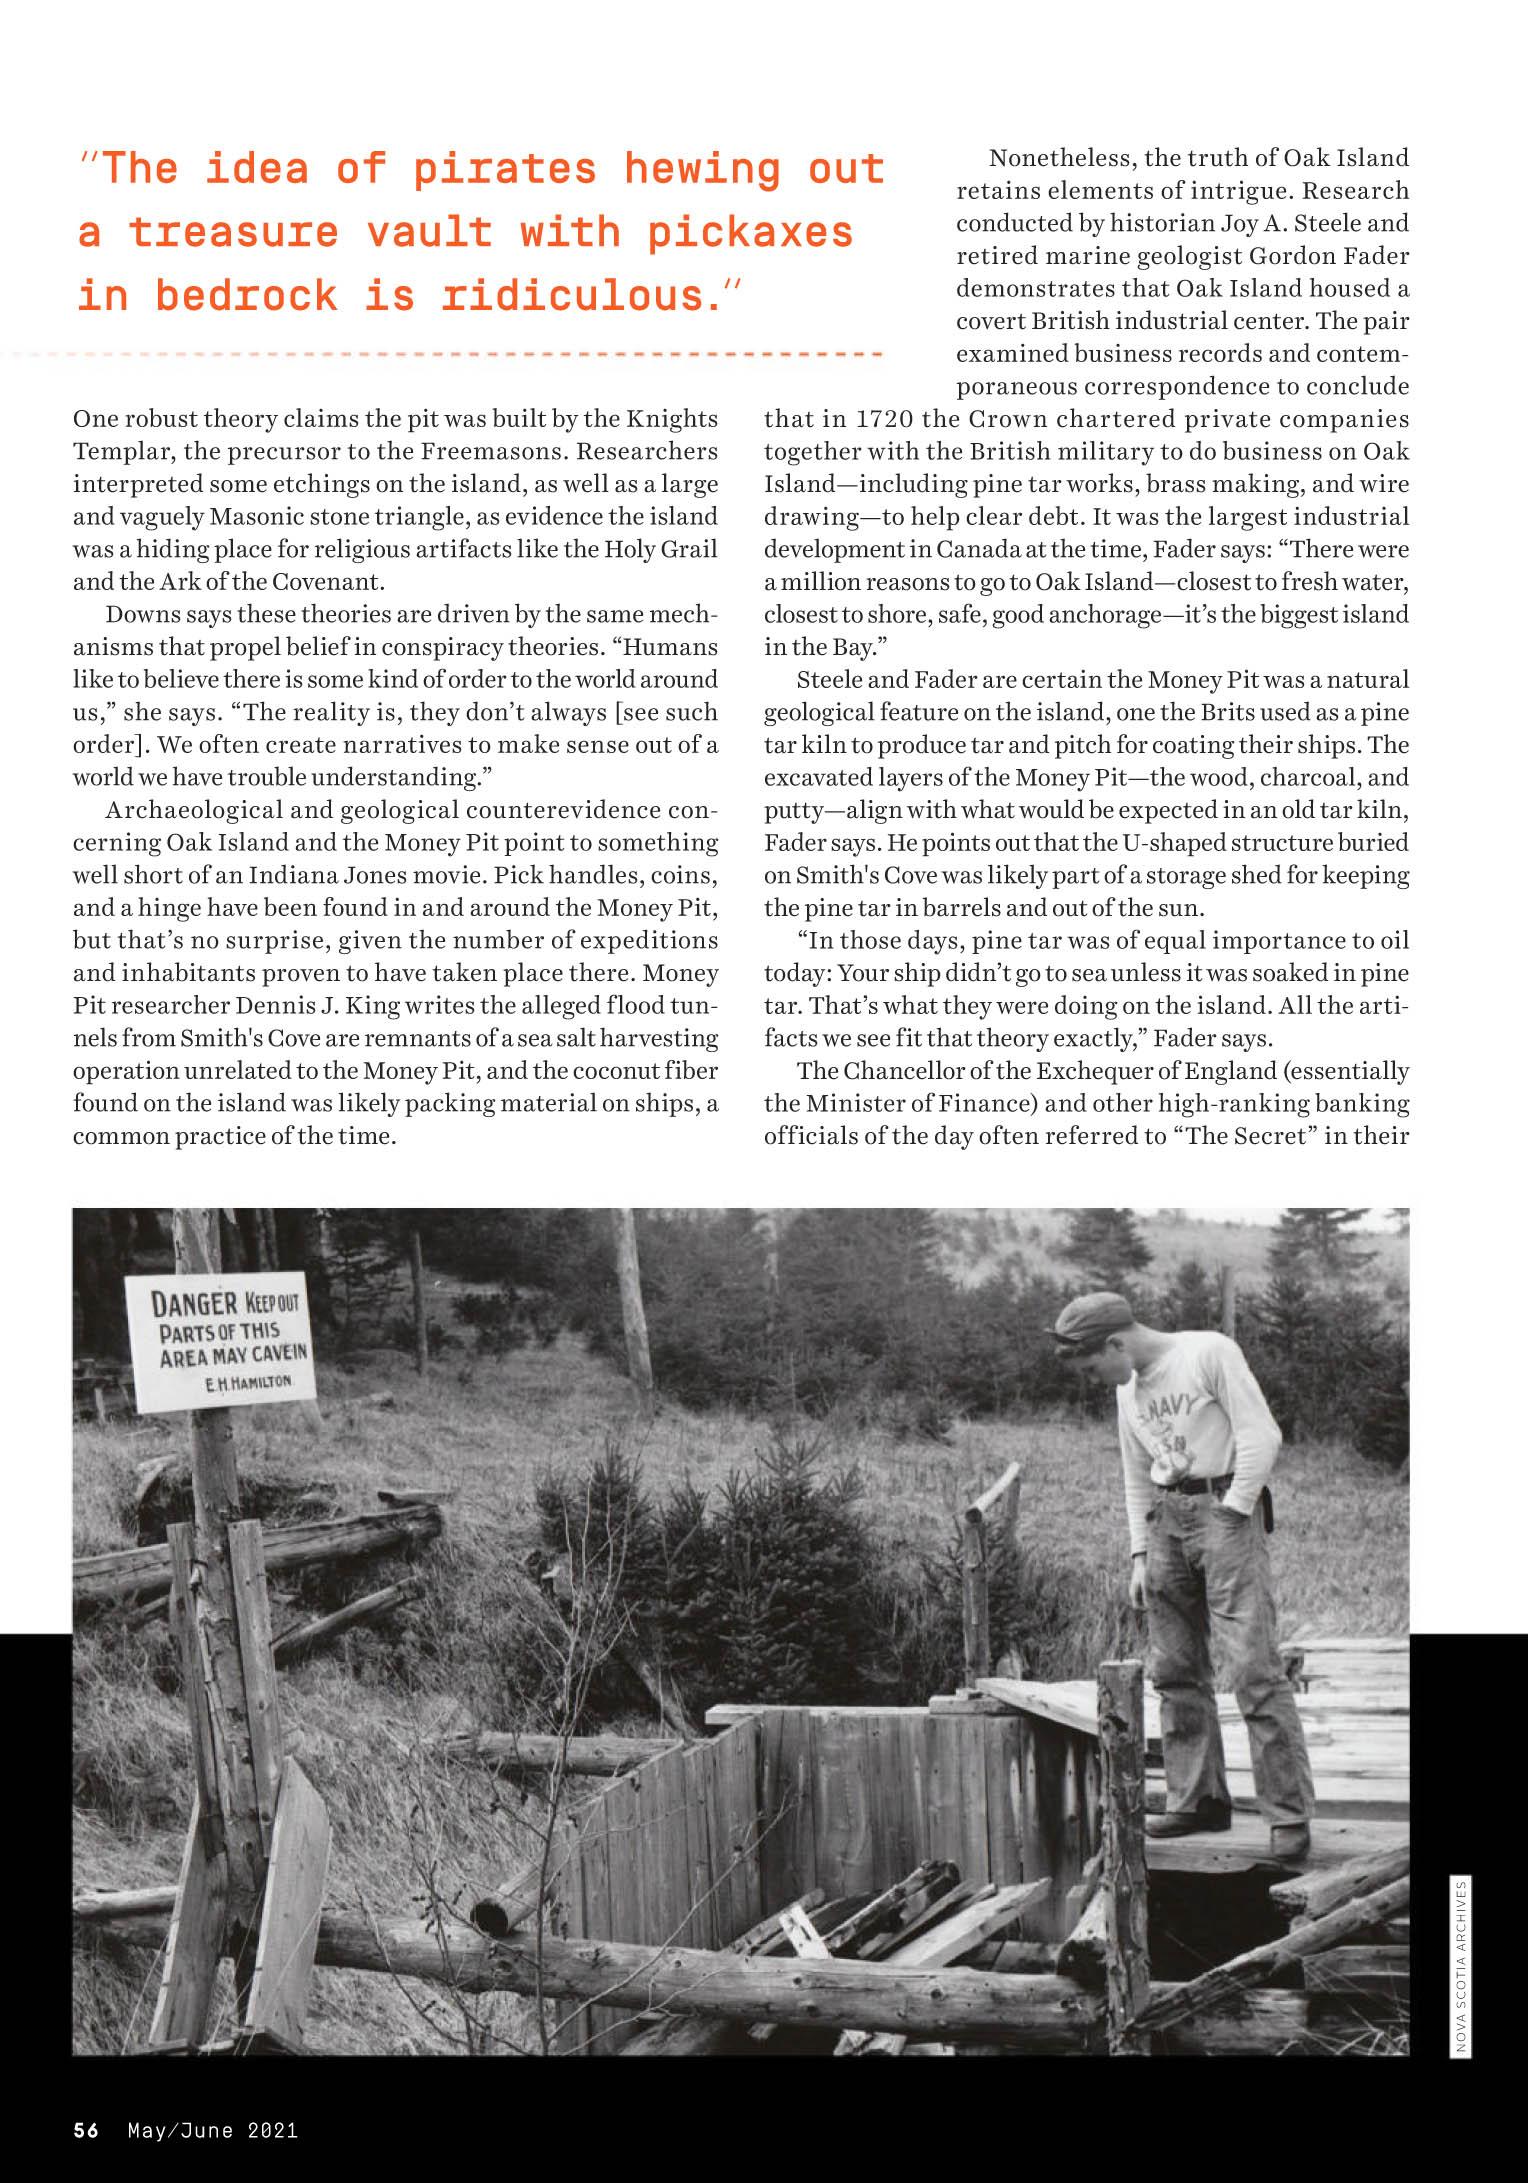 Popular Mechanics 2021-05-06 Oak Island 06.jpg